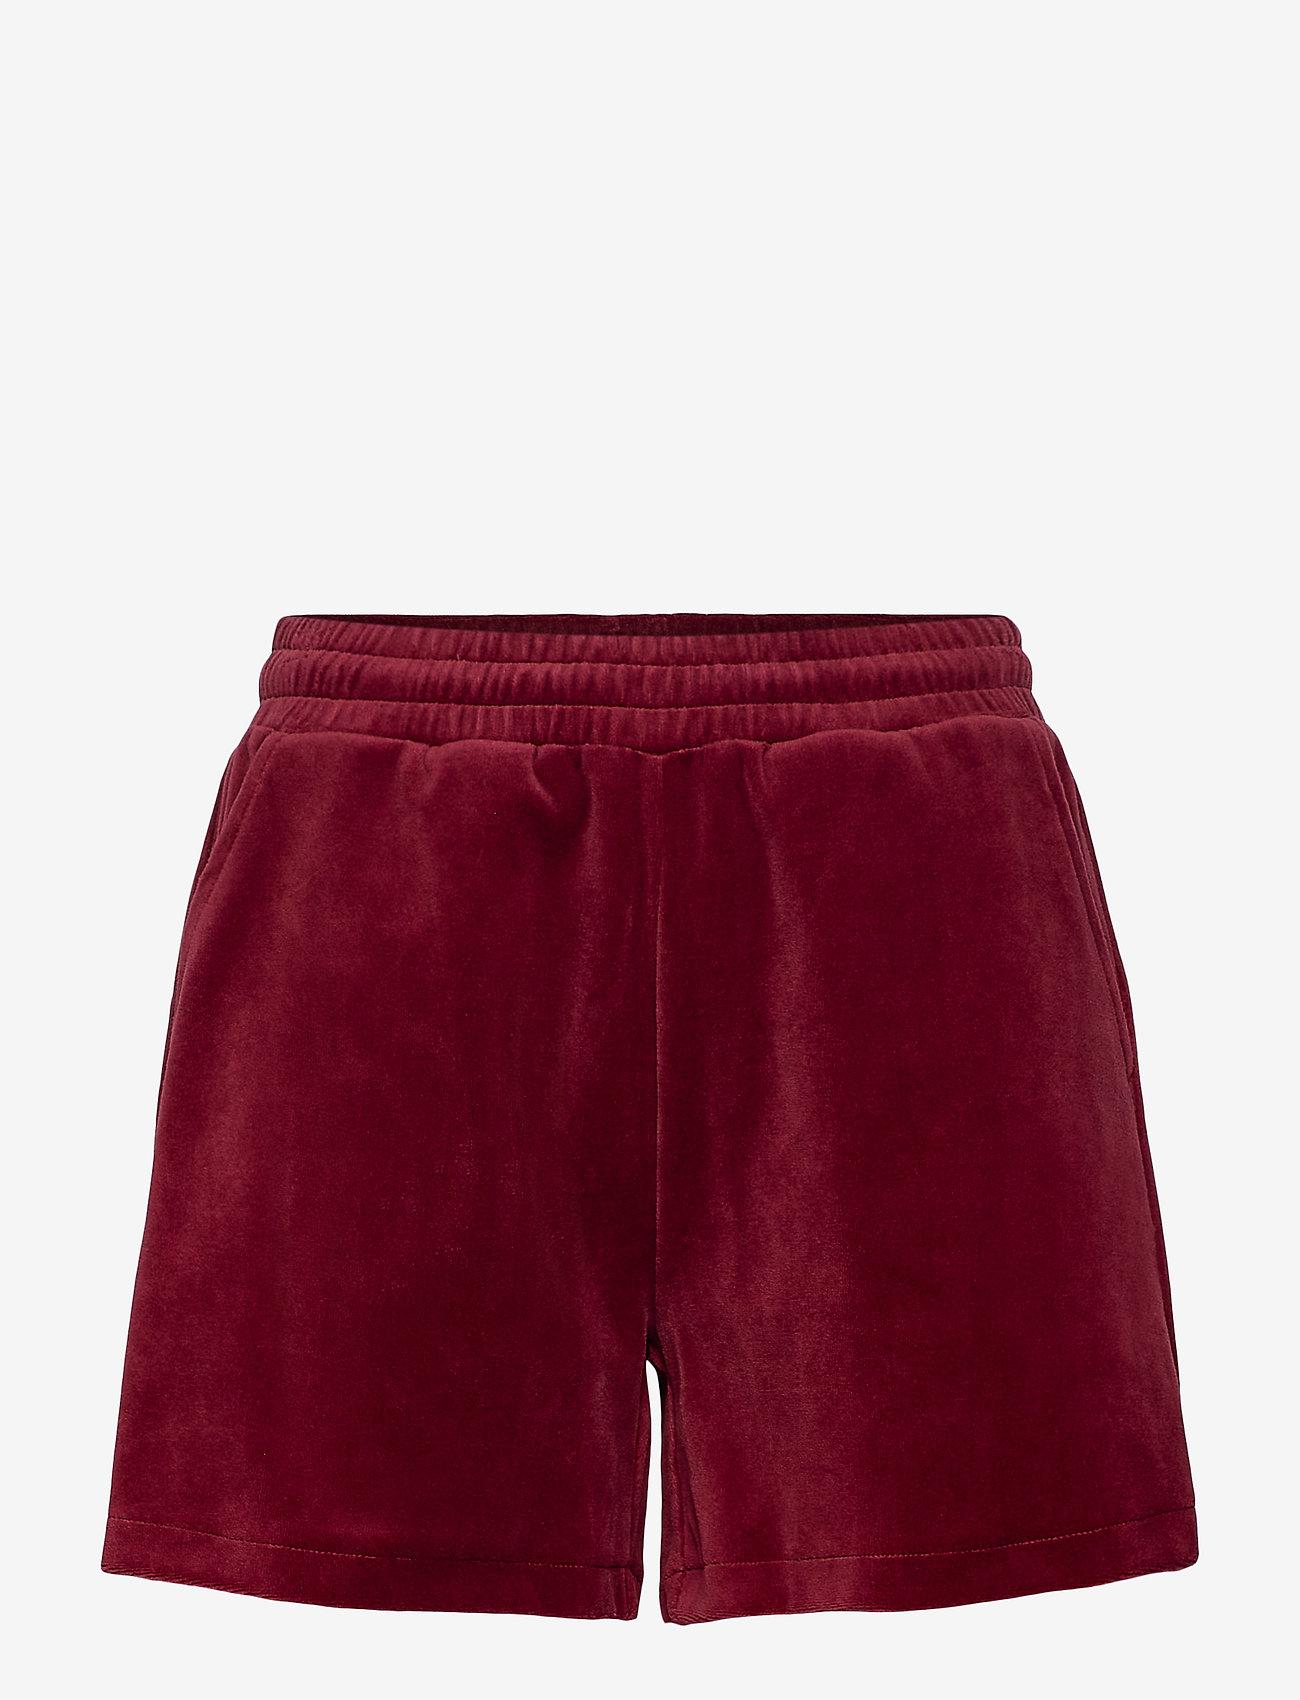 Rosemunde - Shorts - shorts casual - cabernet - 0